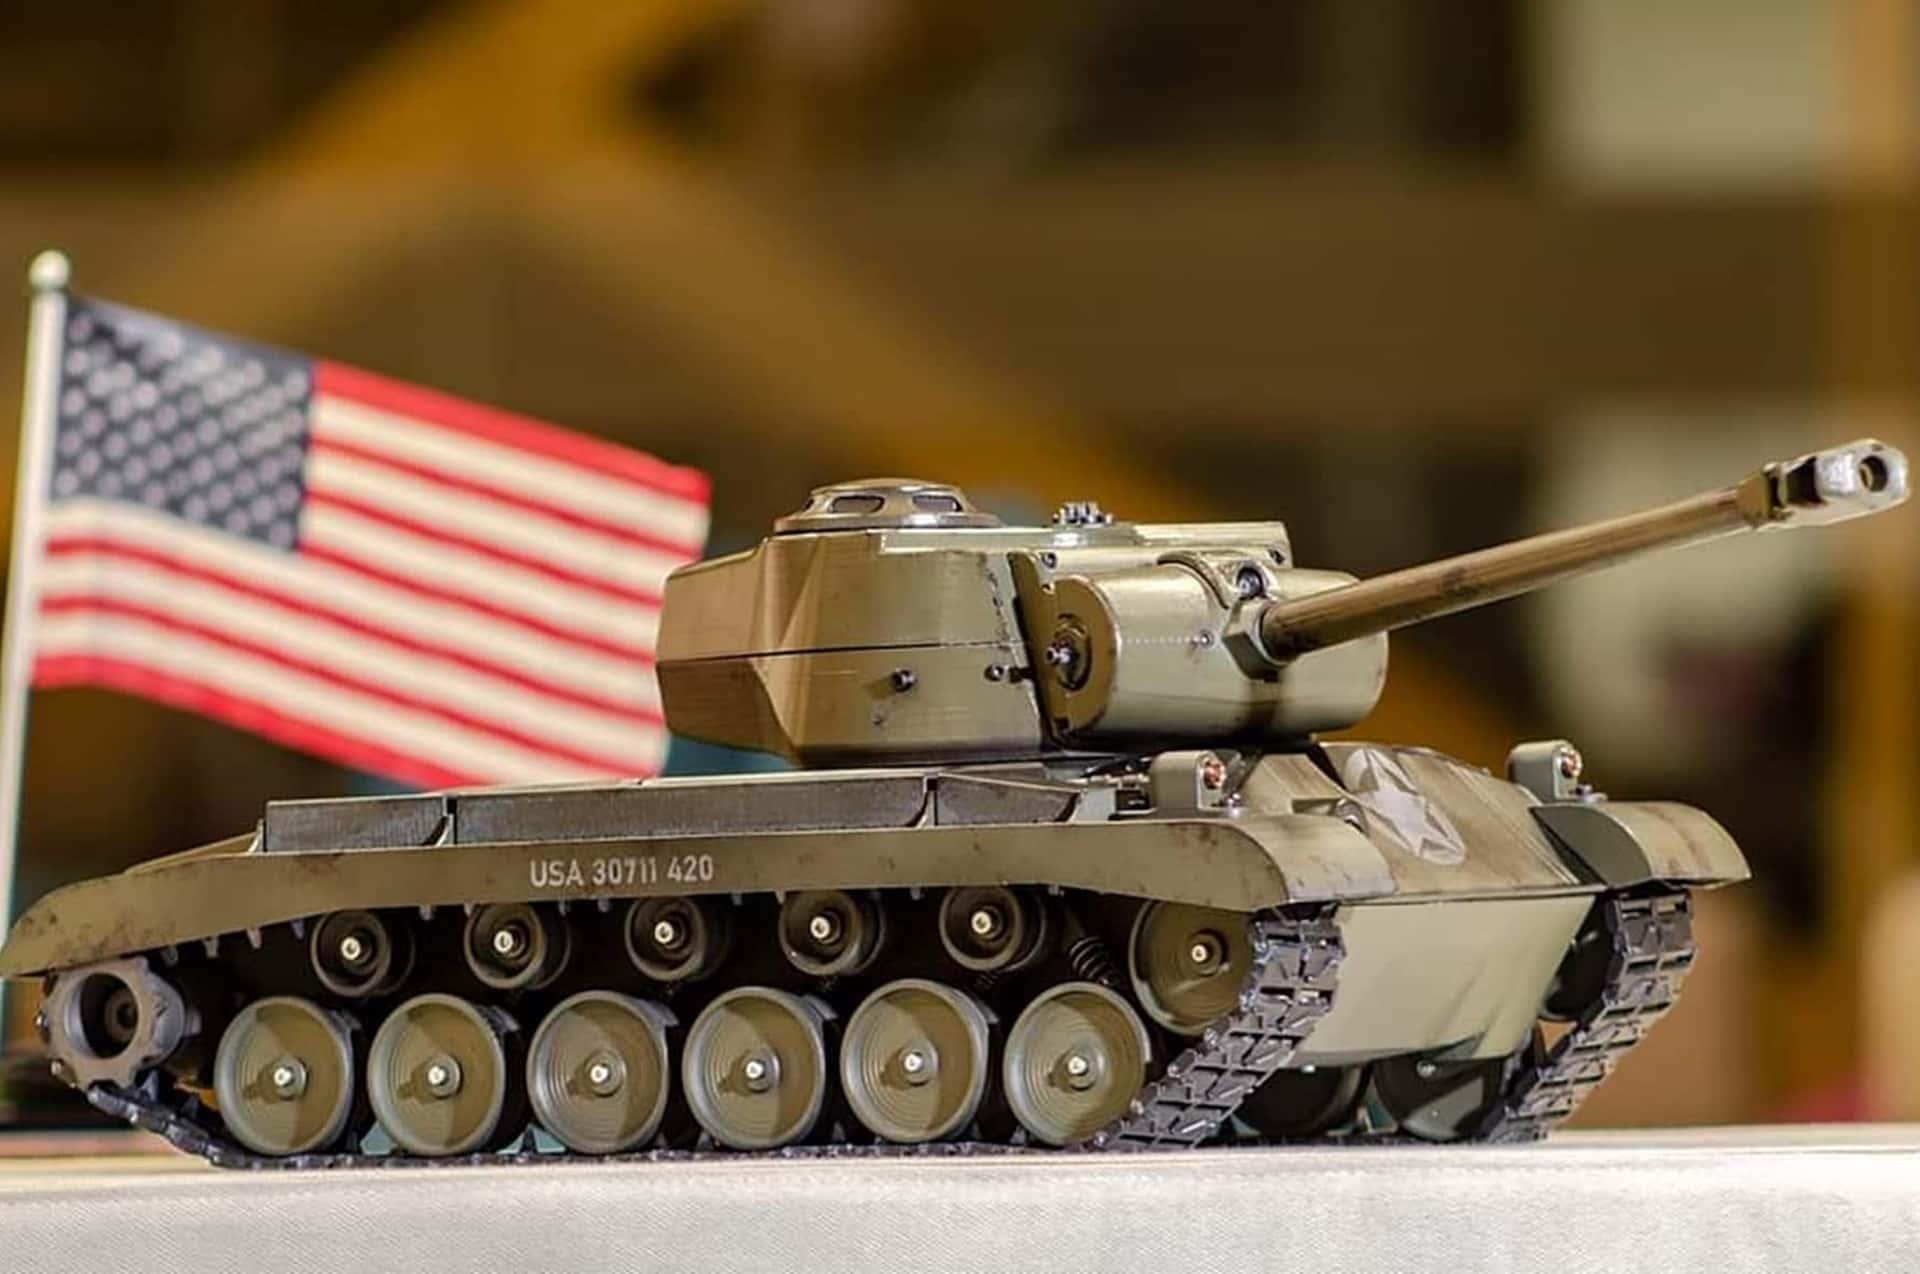 3D printed tank housing